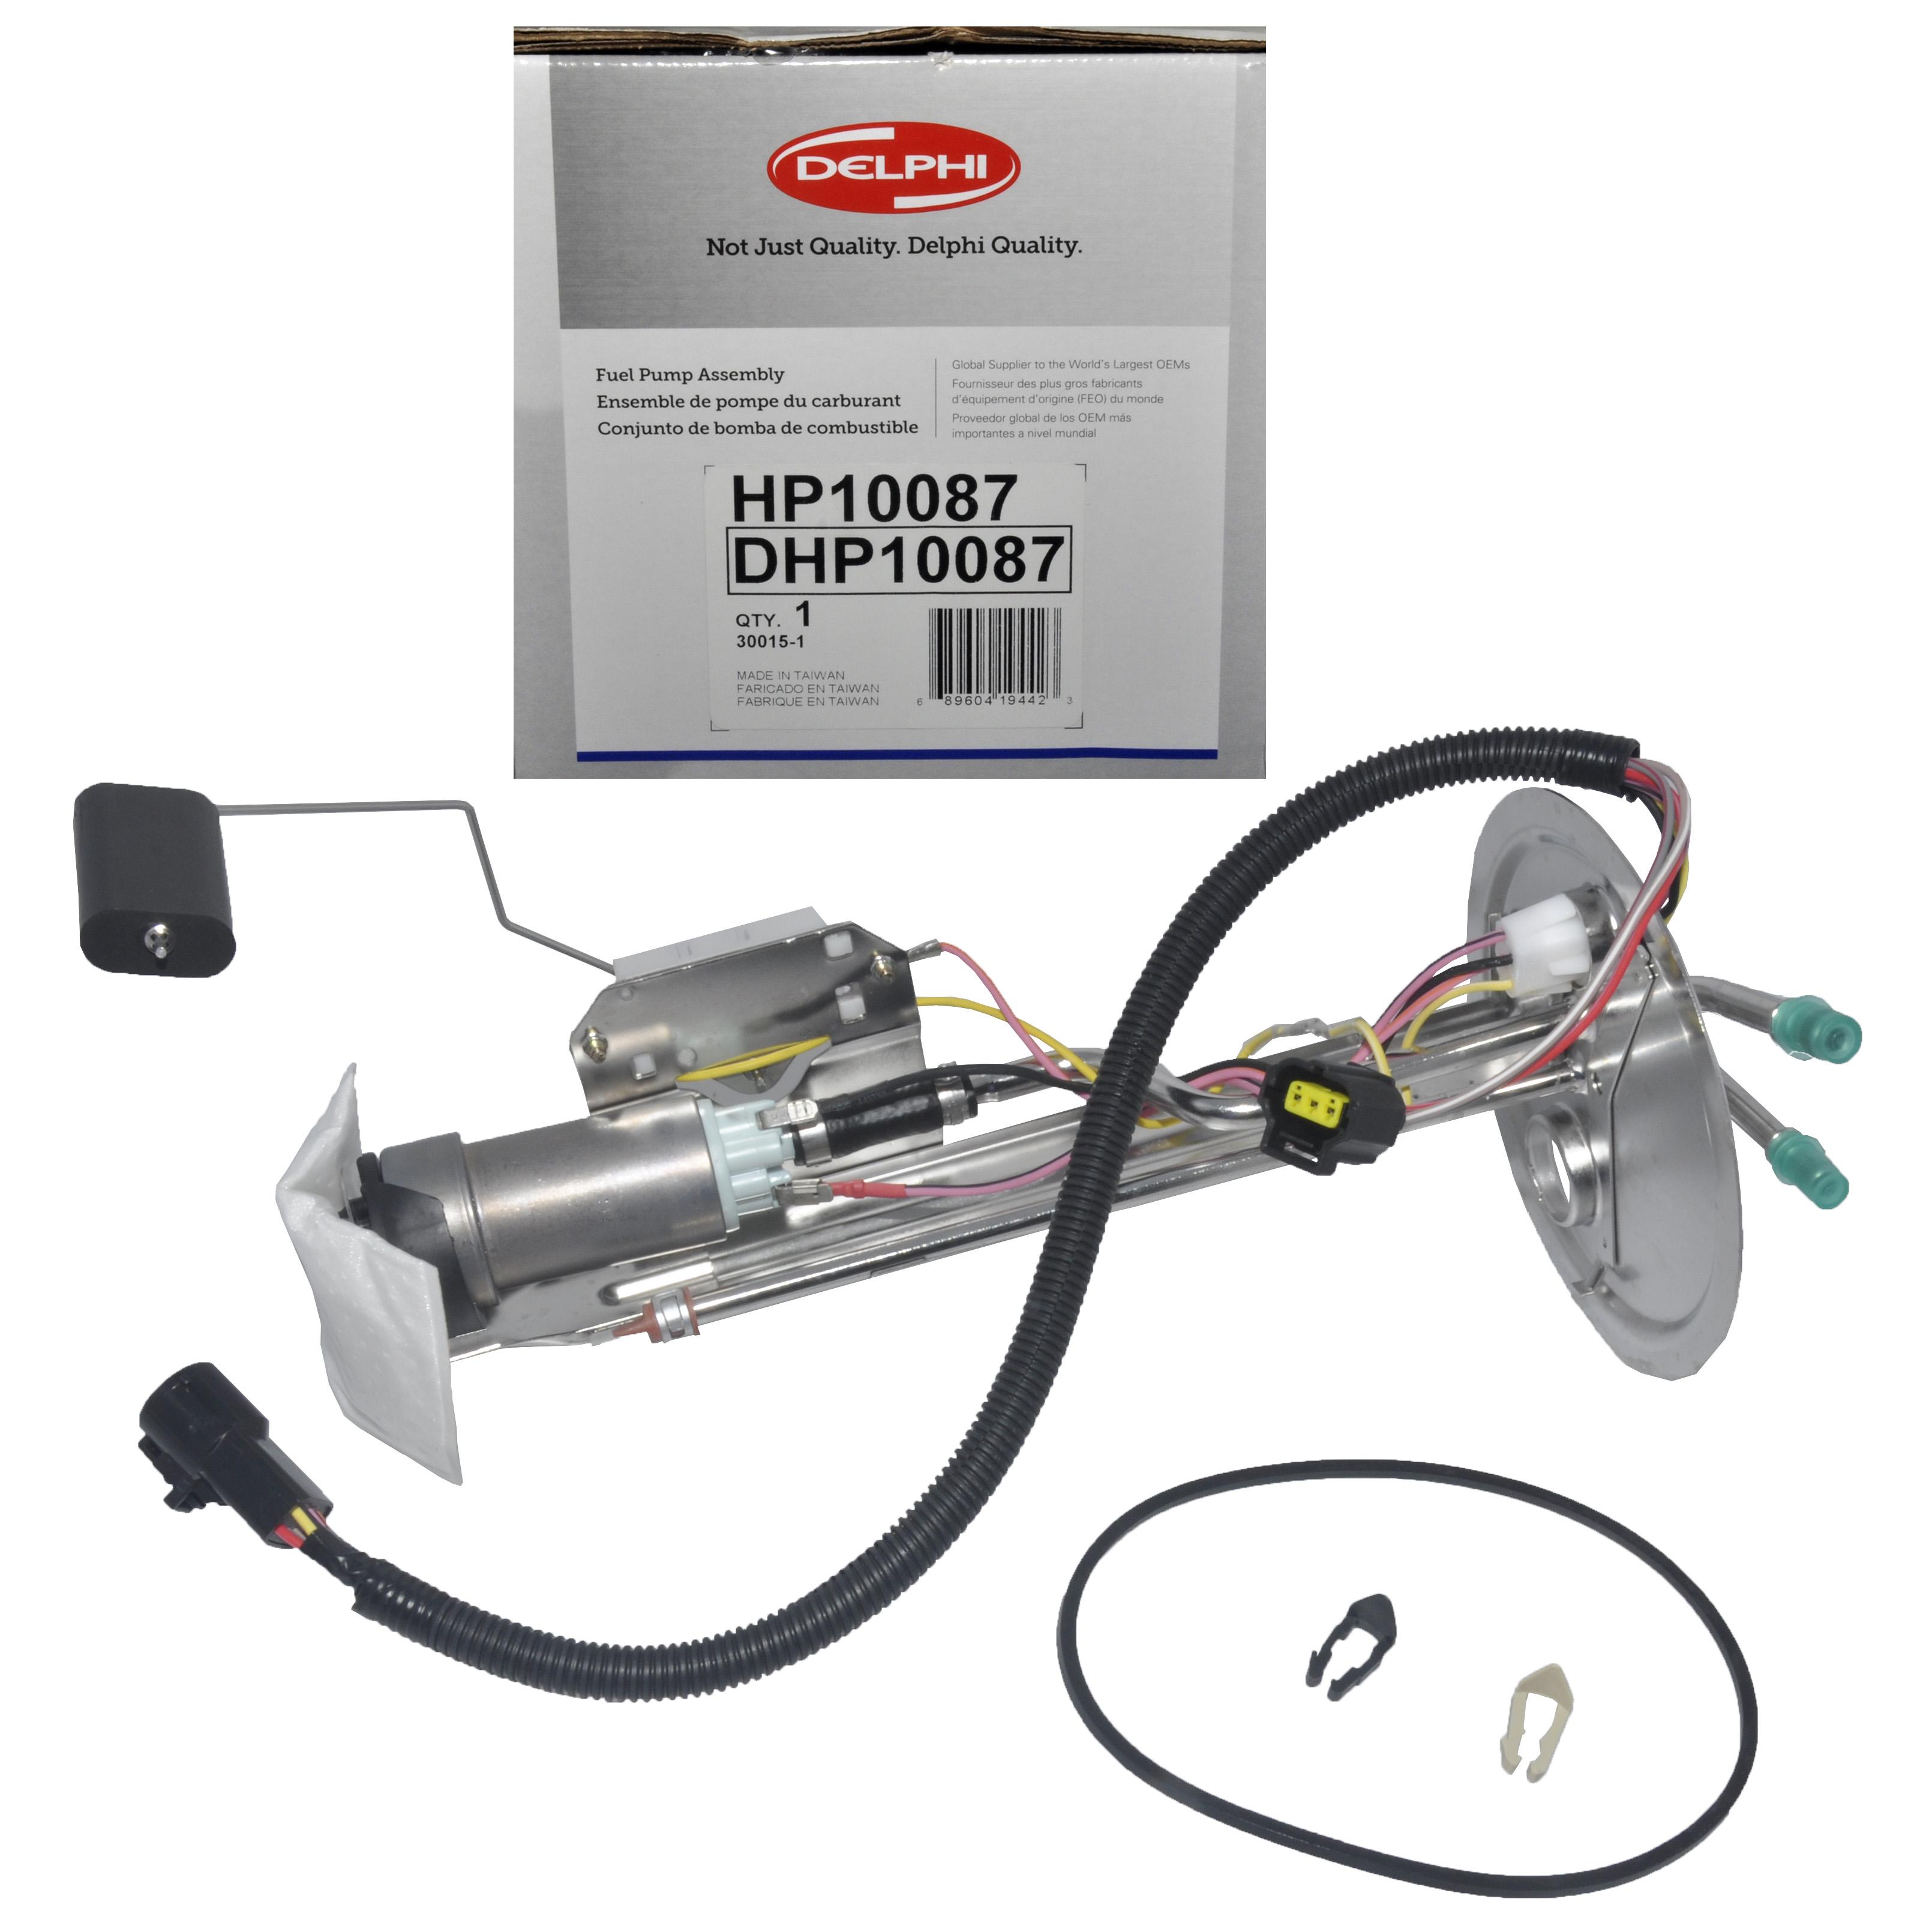 Delphi Fuel Hanger HP10087 For Ford Expedition Navigator 4.6L 5.4L 4WD 99-02